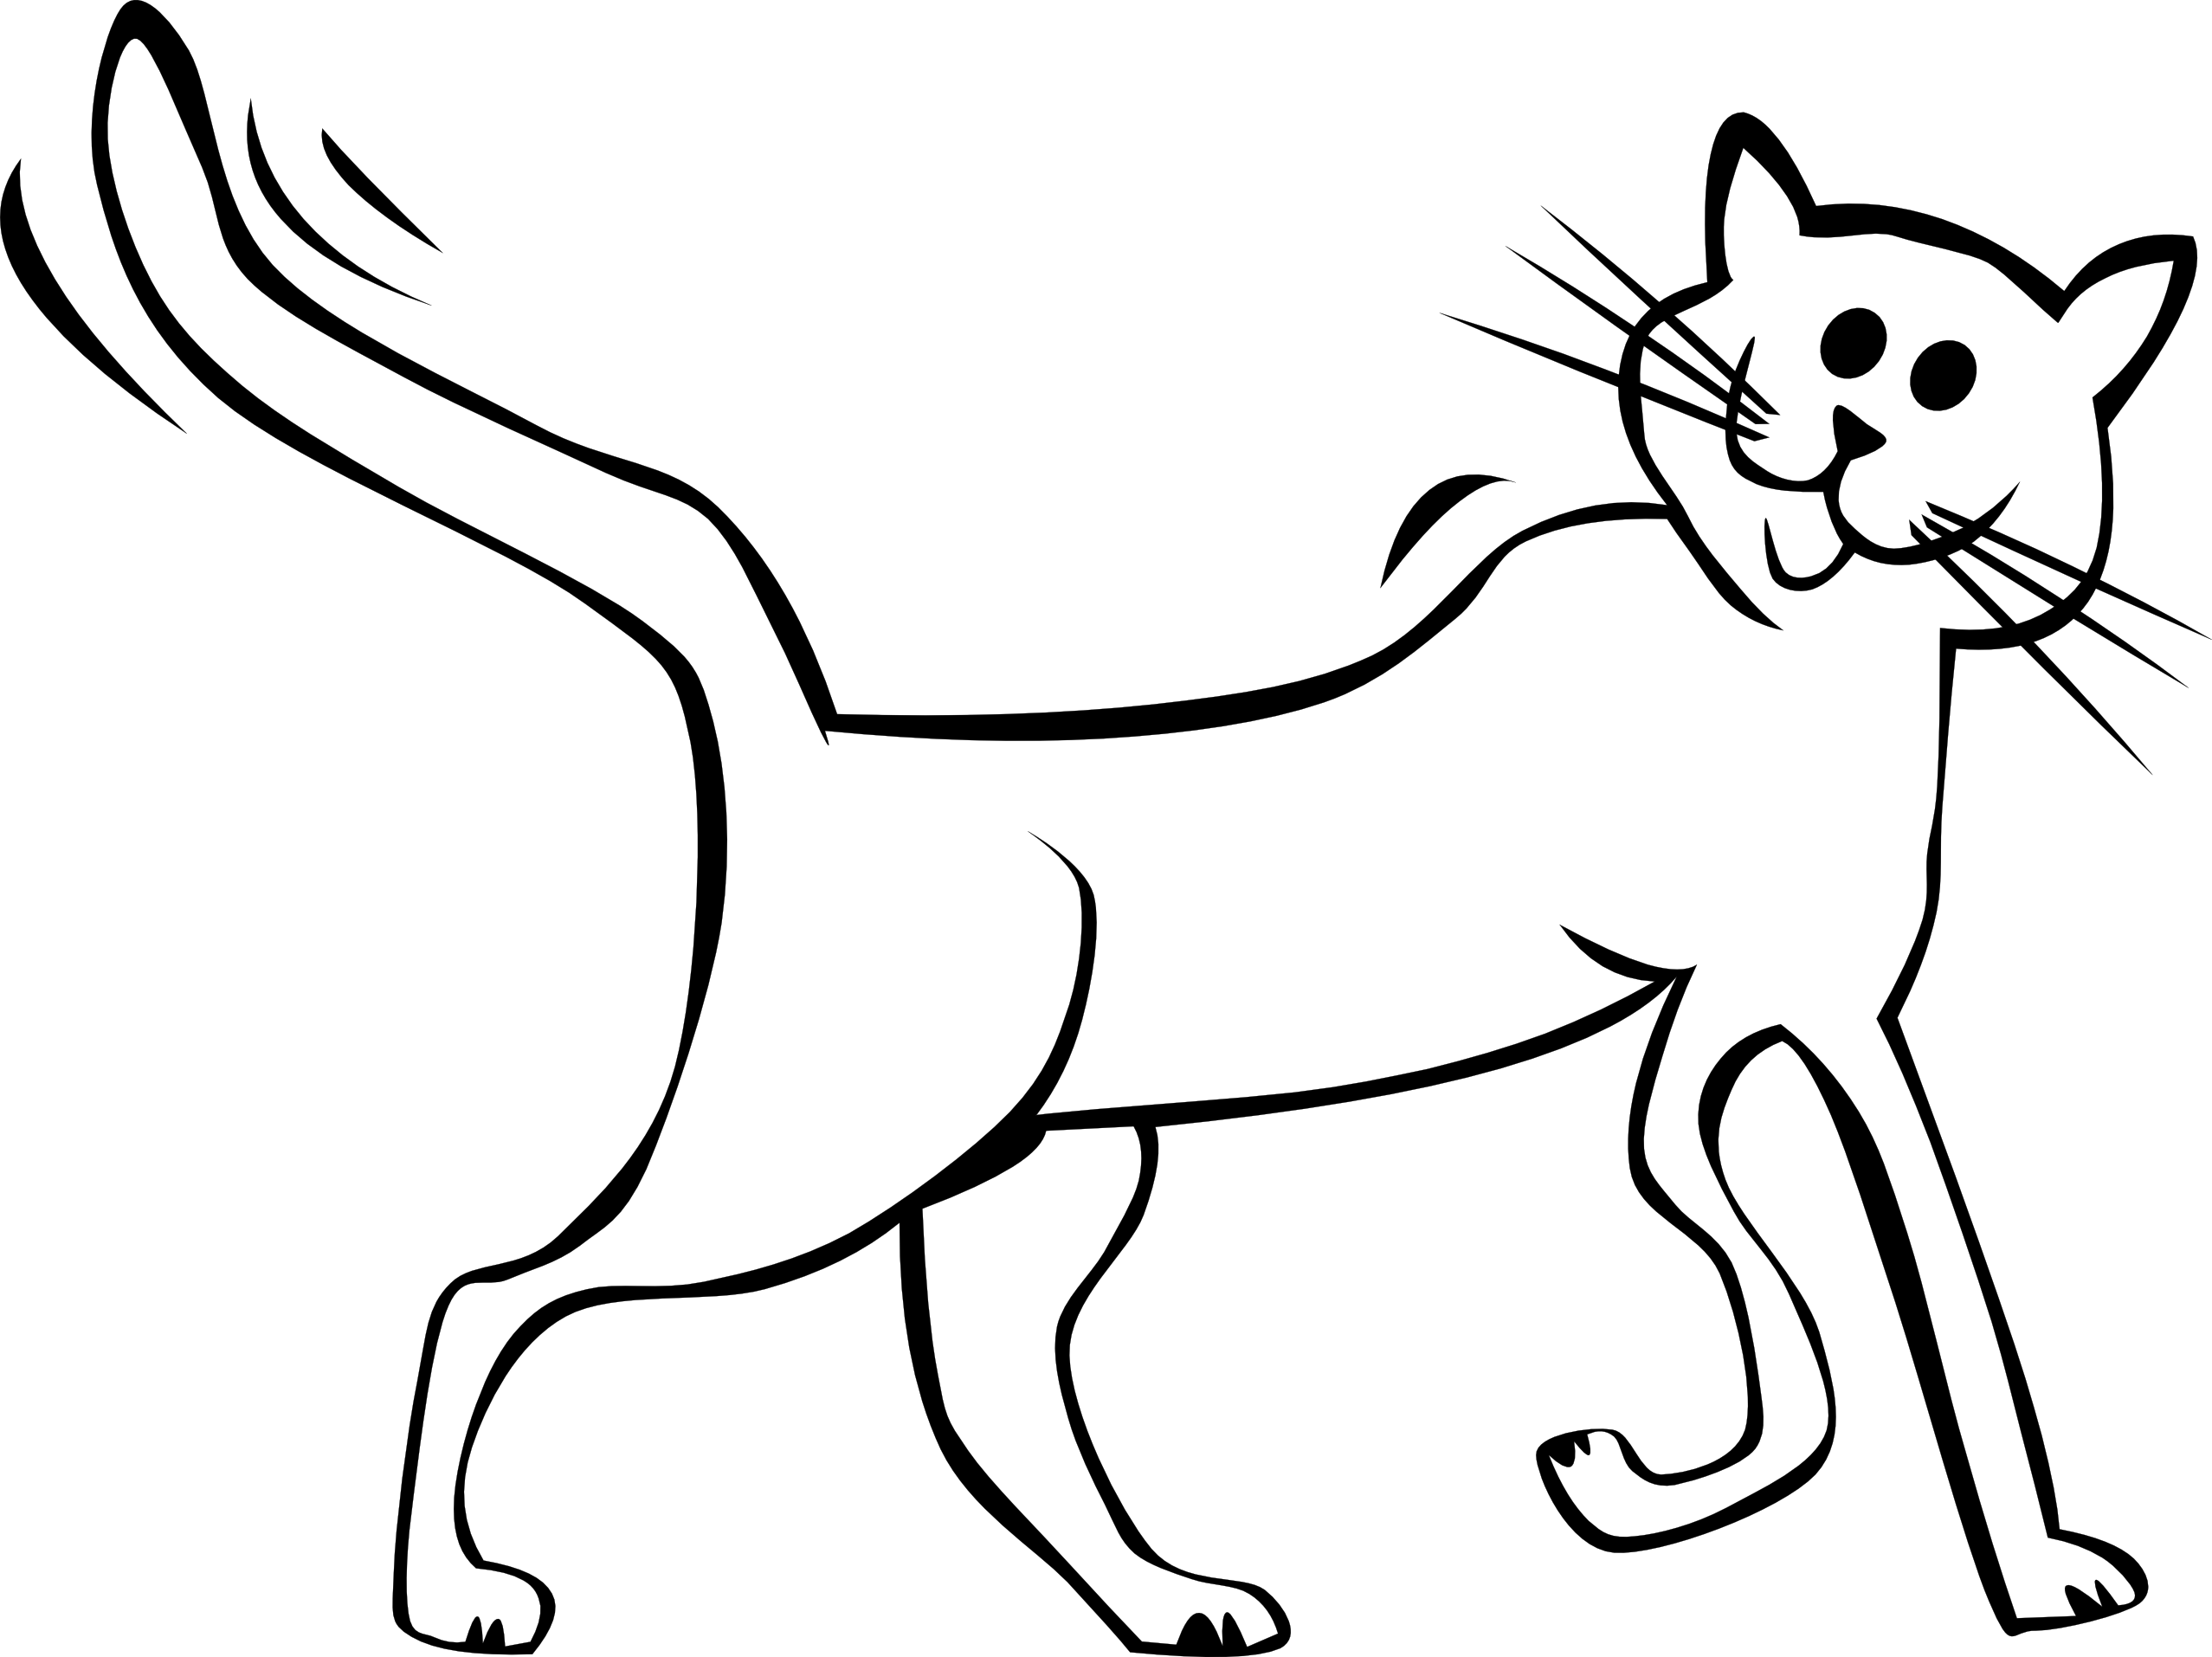 Рисунок кот чёрный кот белый кот